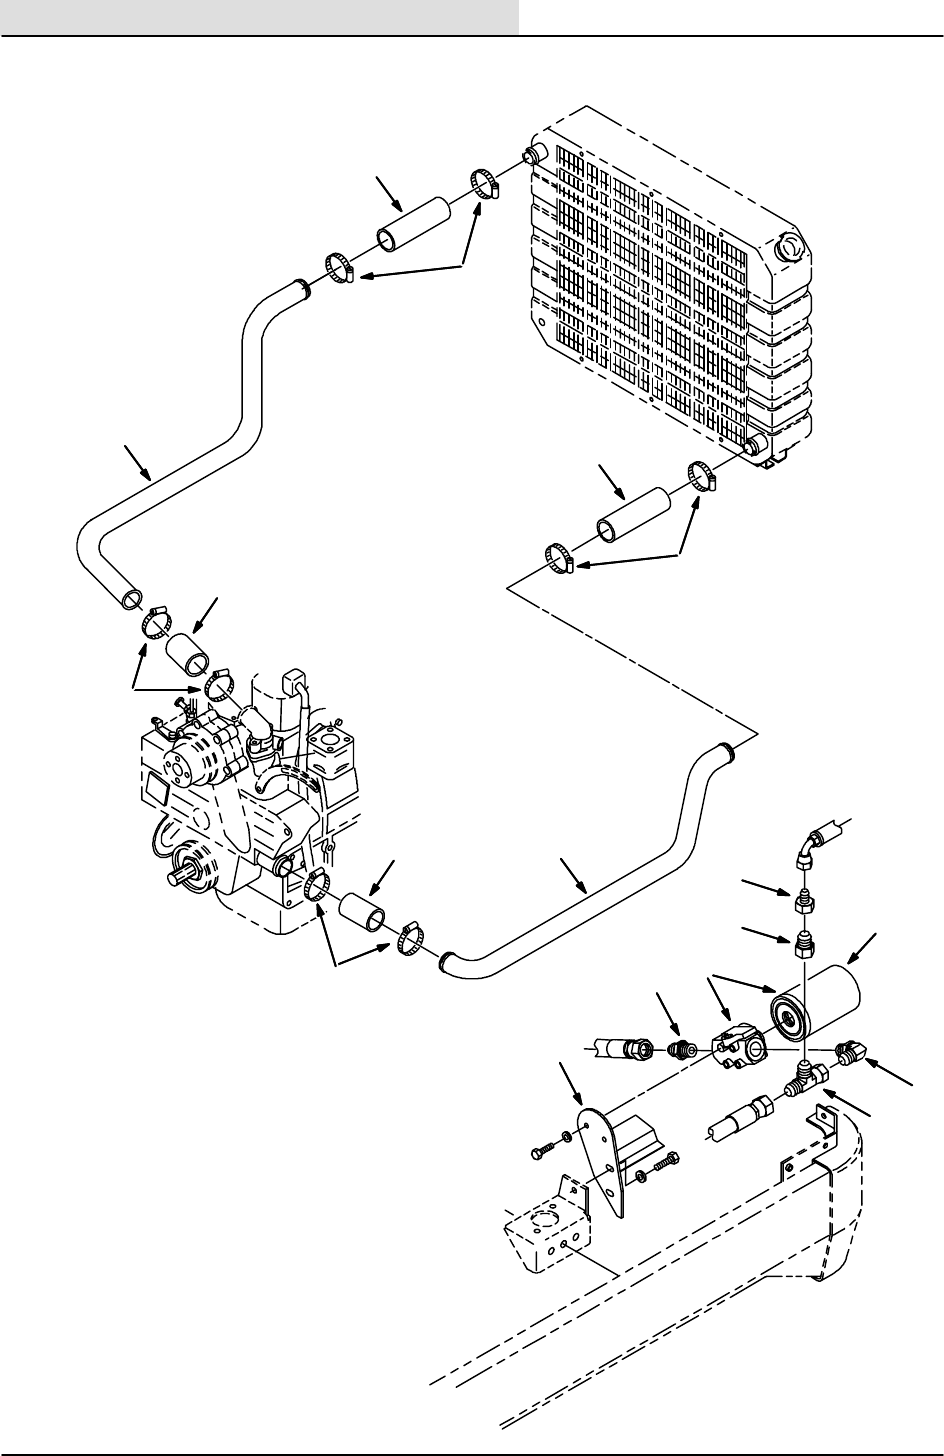 8400D NA Parts Manual 8400 Diesel